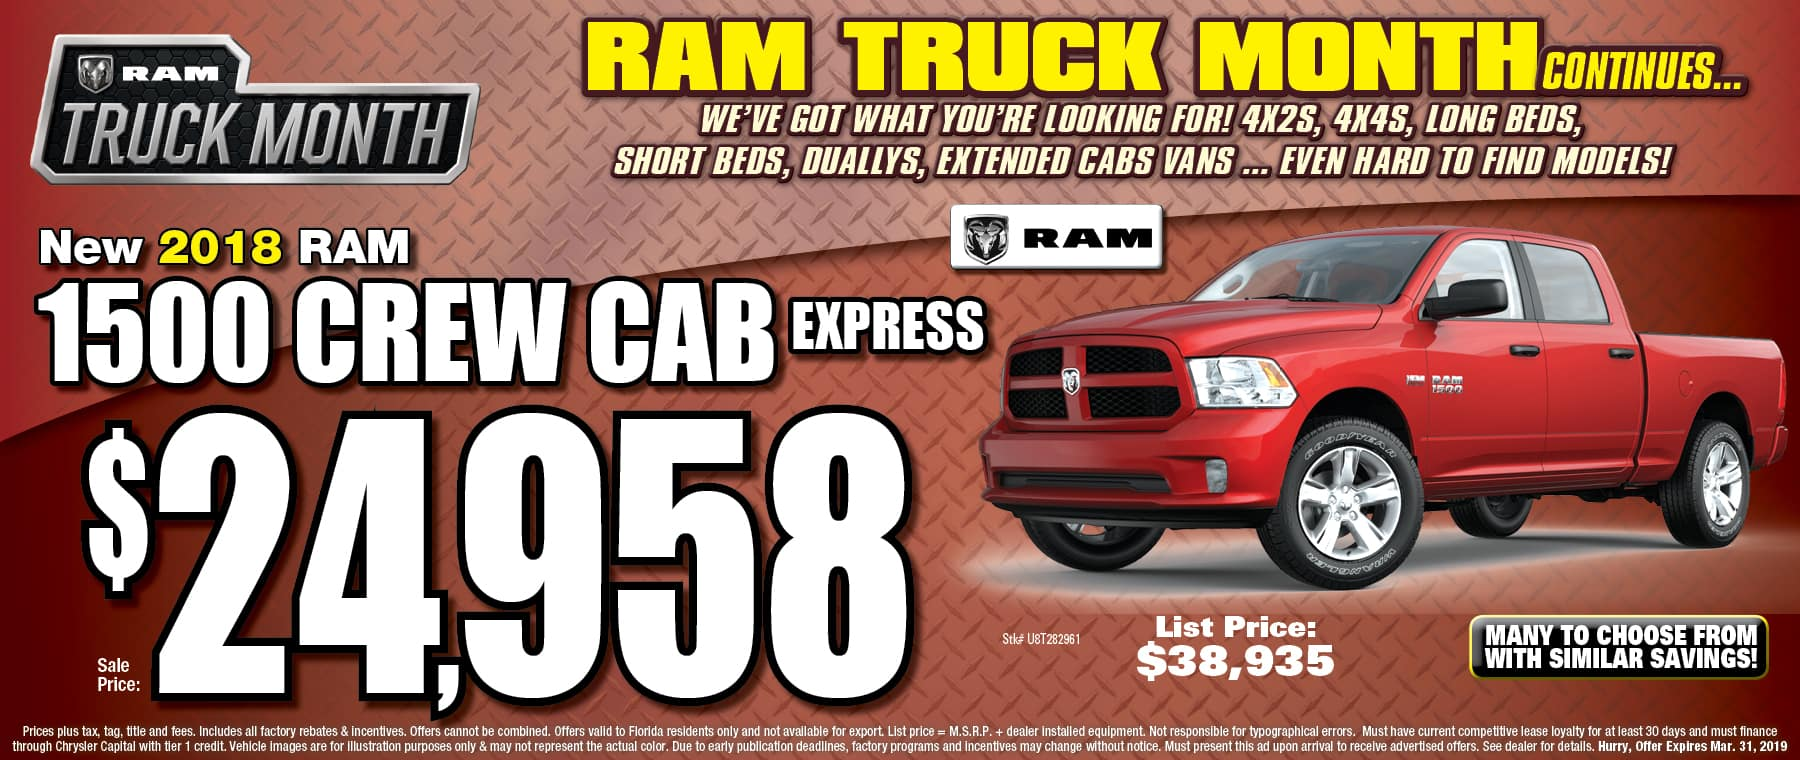 Ram Crew Cab Express! - University Dodge RAM!